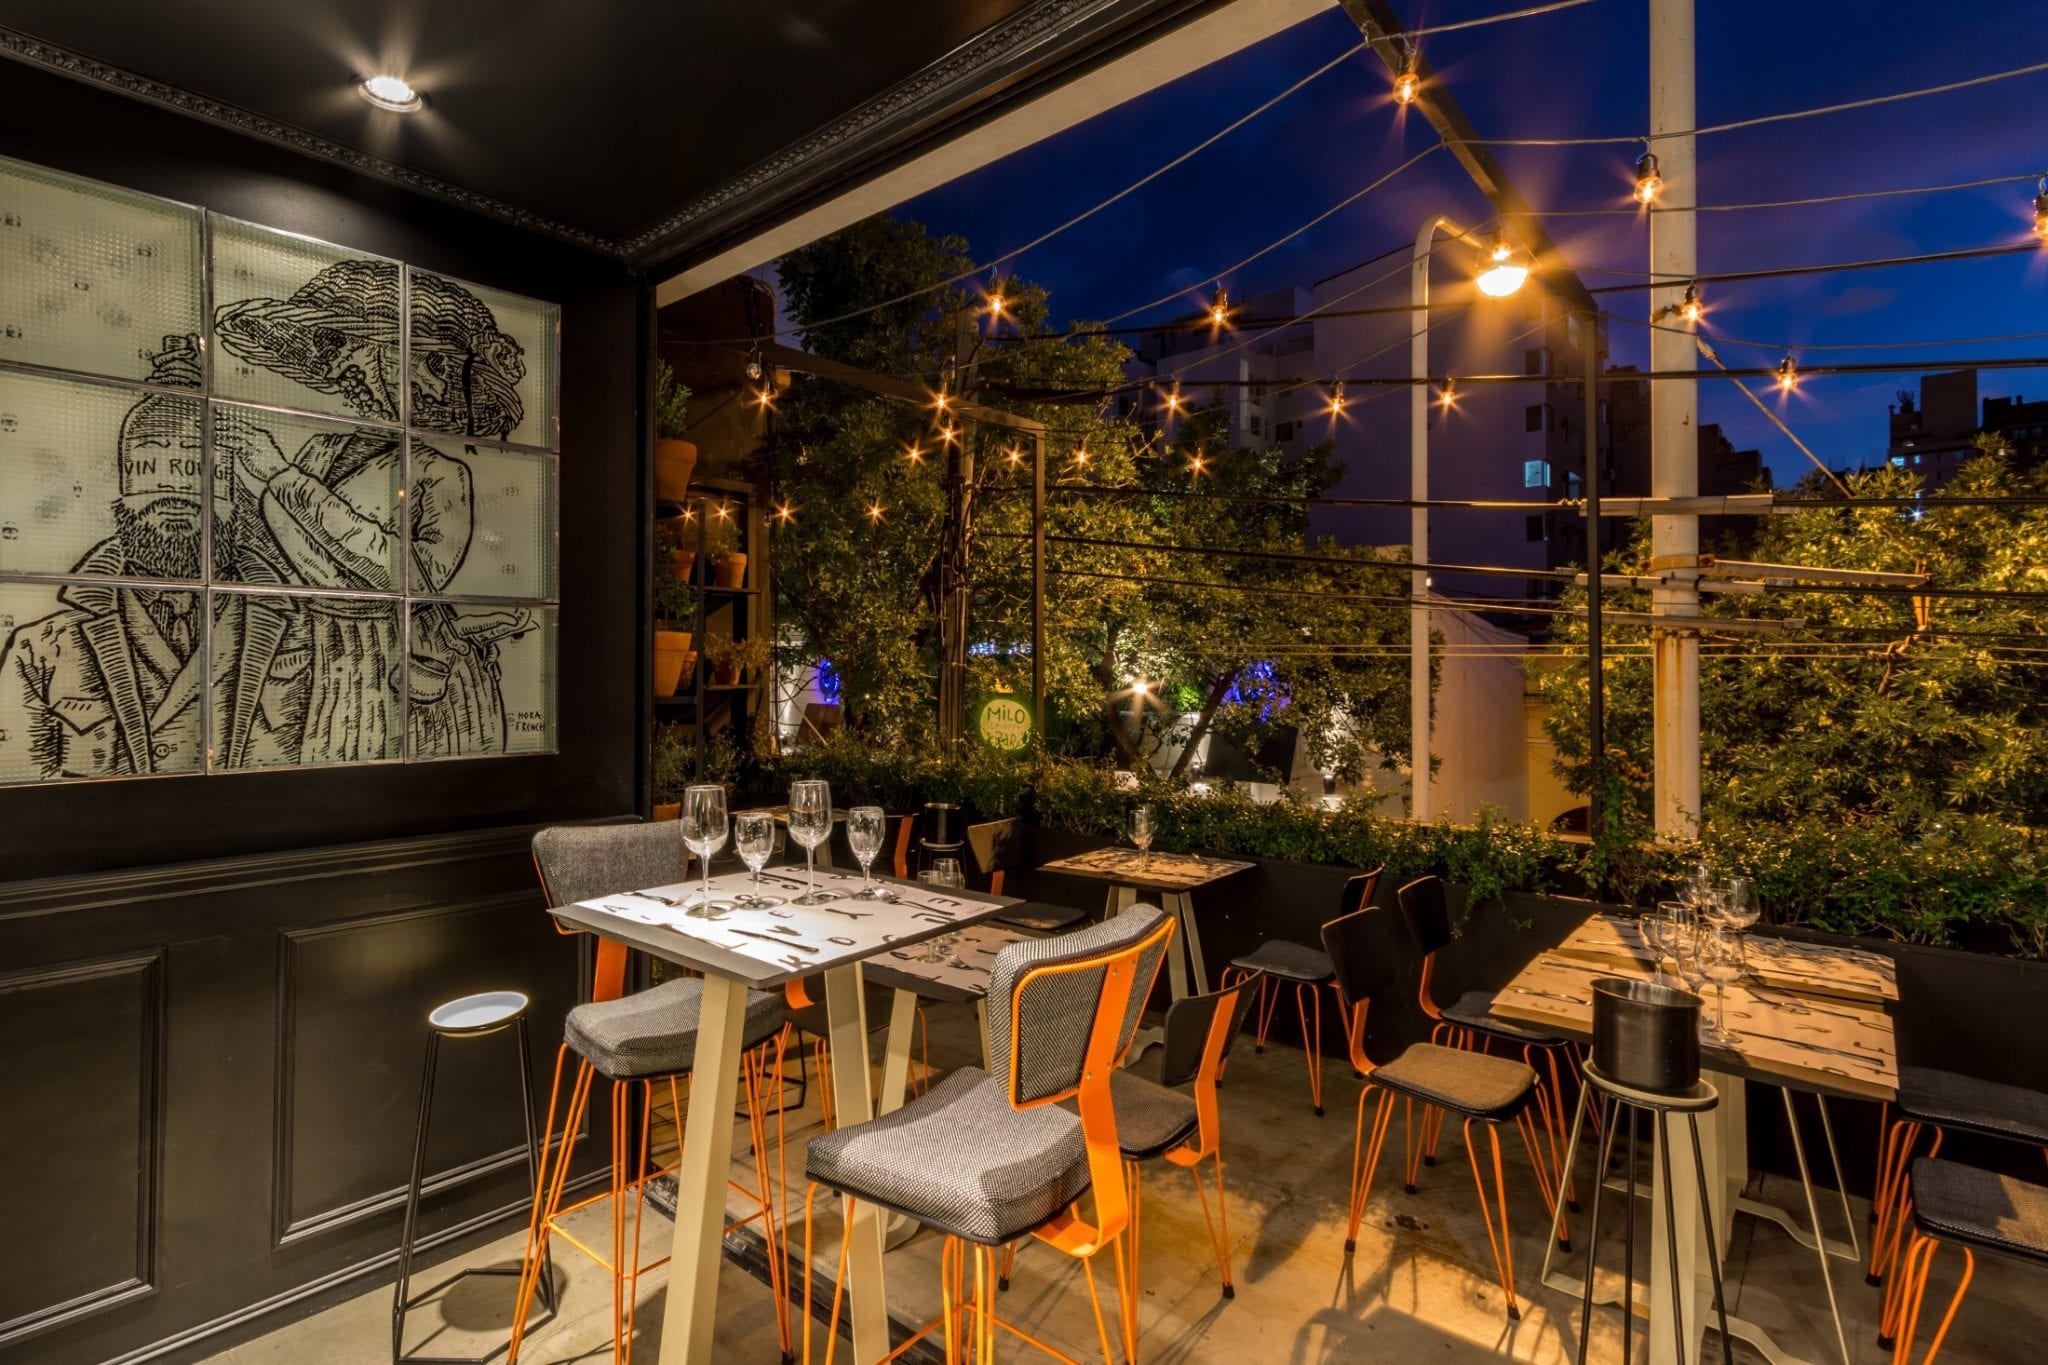 090317  -  Gordo Restoran ph G Viramonte-4420